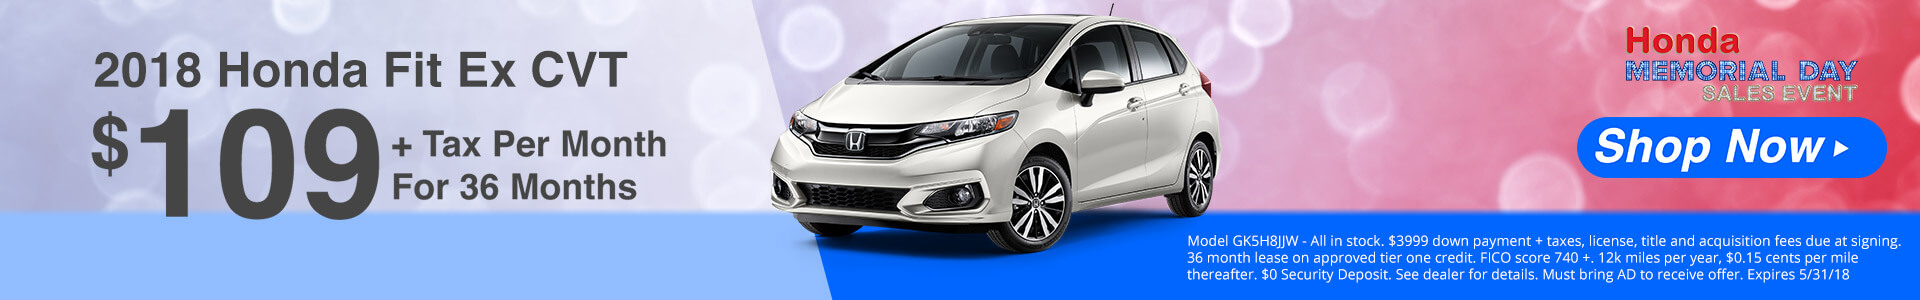 Honda Fit $109 Lease